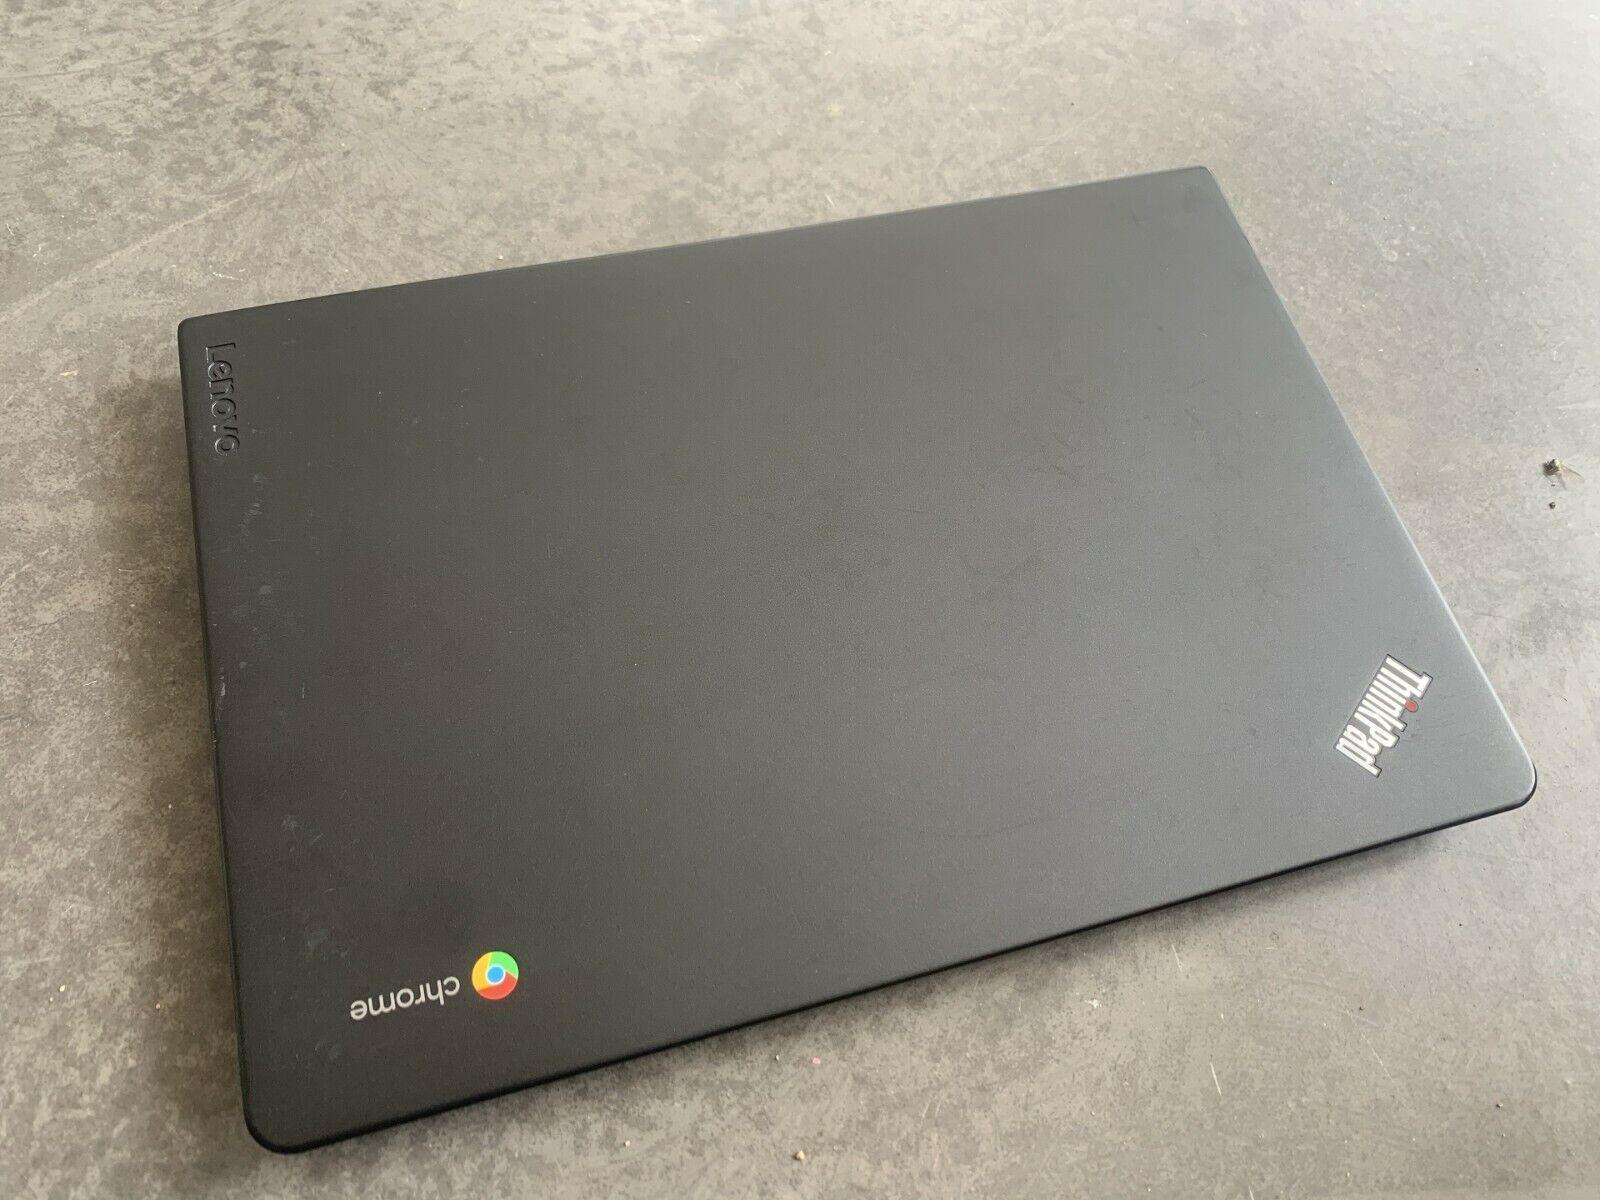 Lenovo thinkpad 13 chromebook core i3 6100u 4gb ram 16gb mmc 13.3